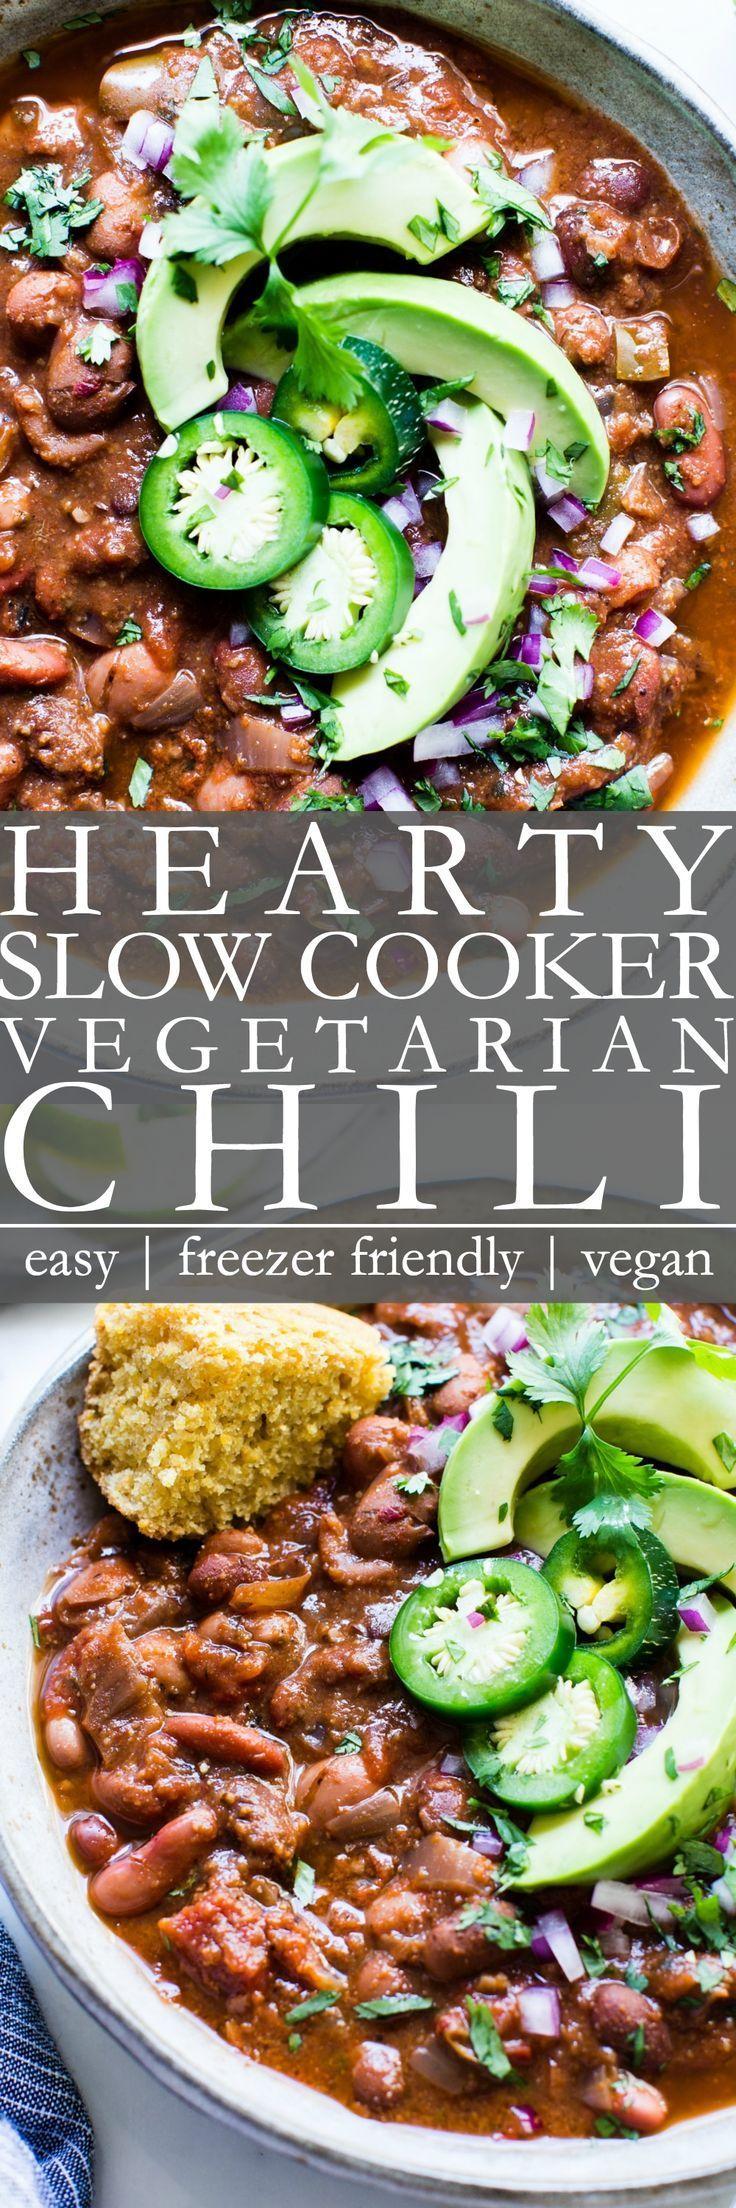 Hearty Crock Pot Vegetarian Chili Vanilla And Bean In 2020 Vegetarian Crockpot Vegetarian Chili Vegetarian Chili Easy